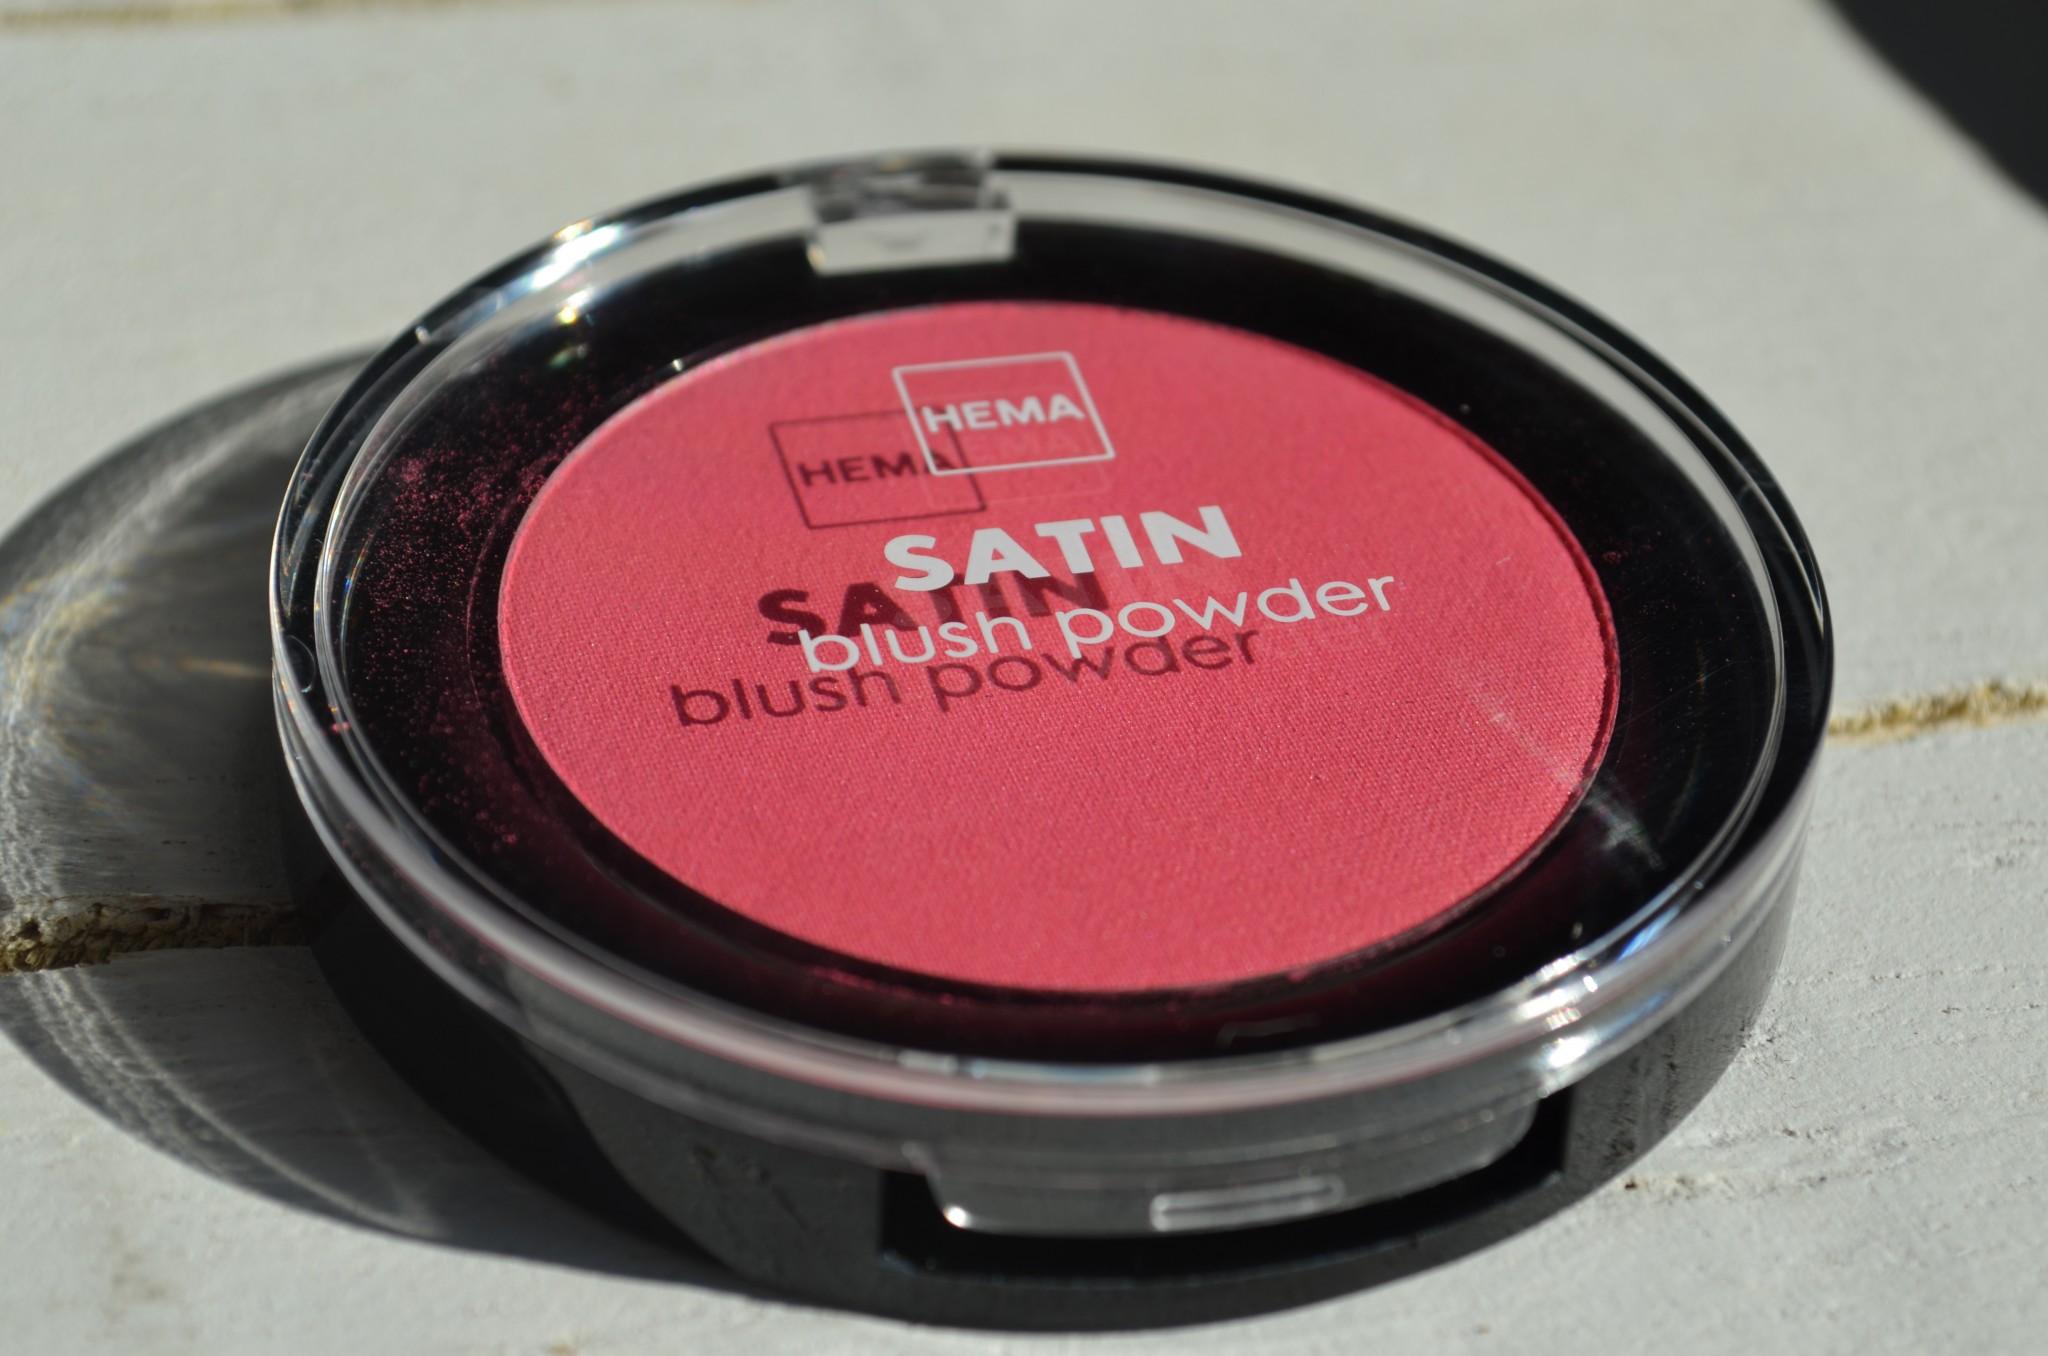 DSC 02221 - Nieuw van Hema! Satin Blush Powder(s) Review